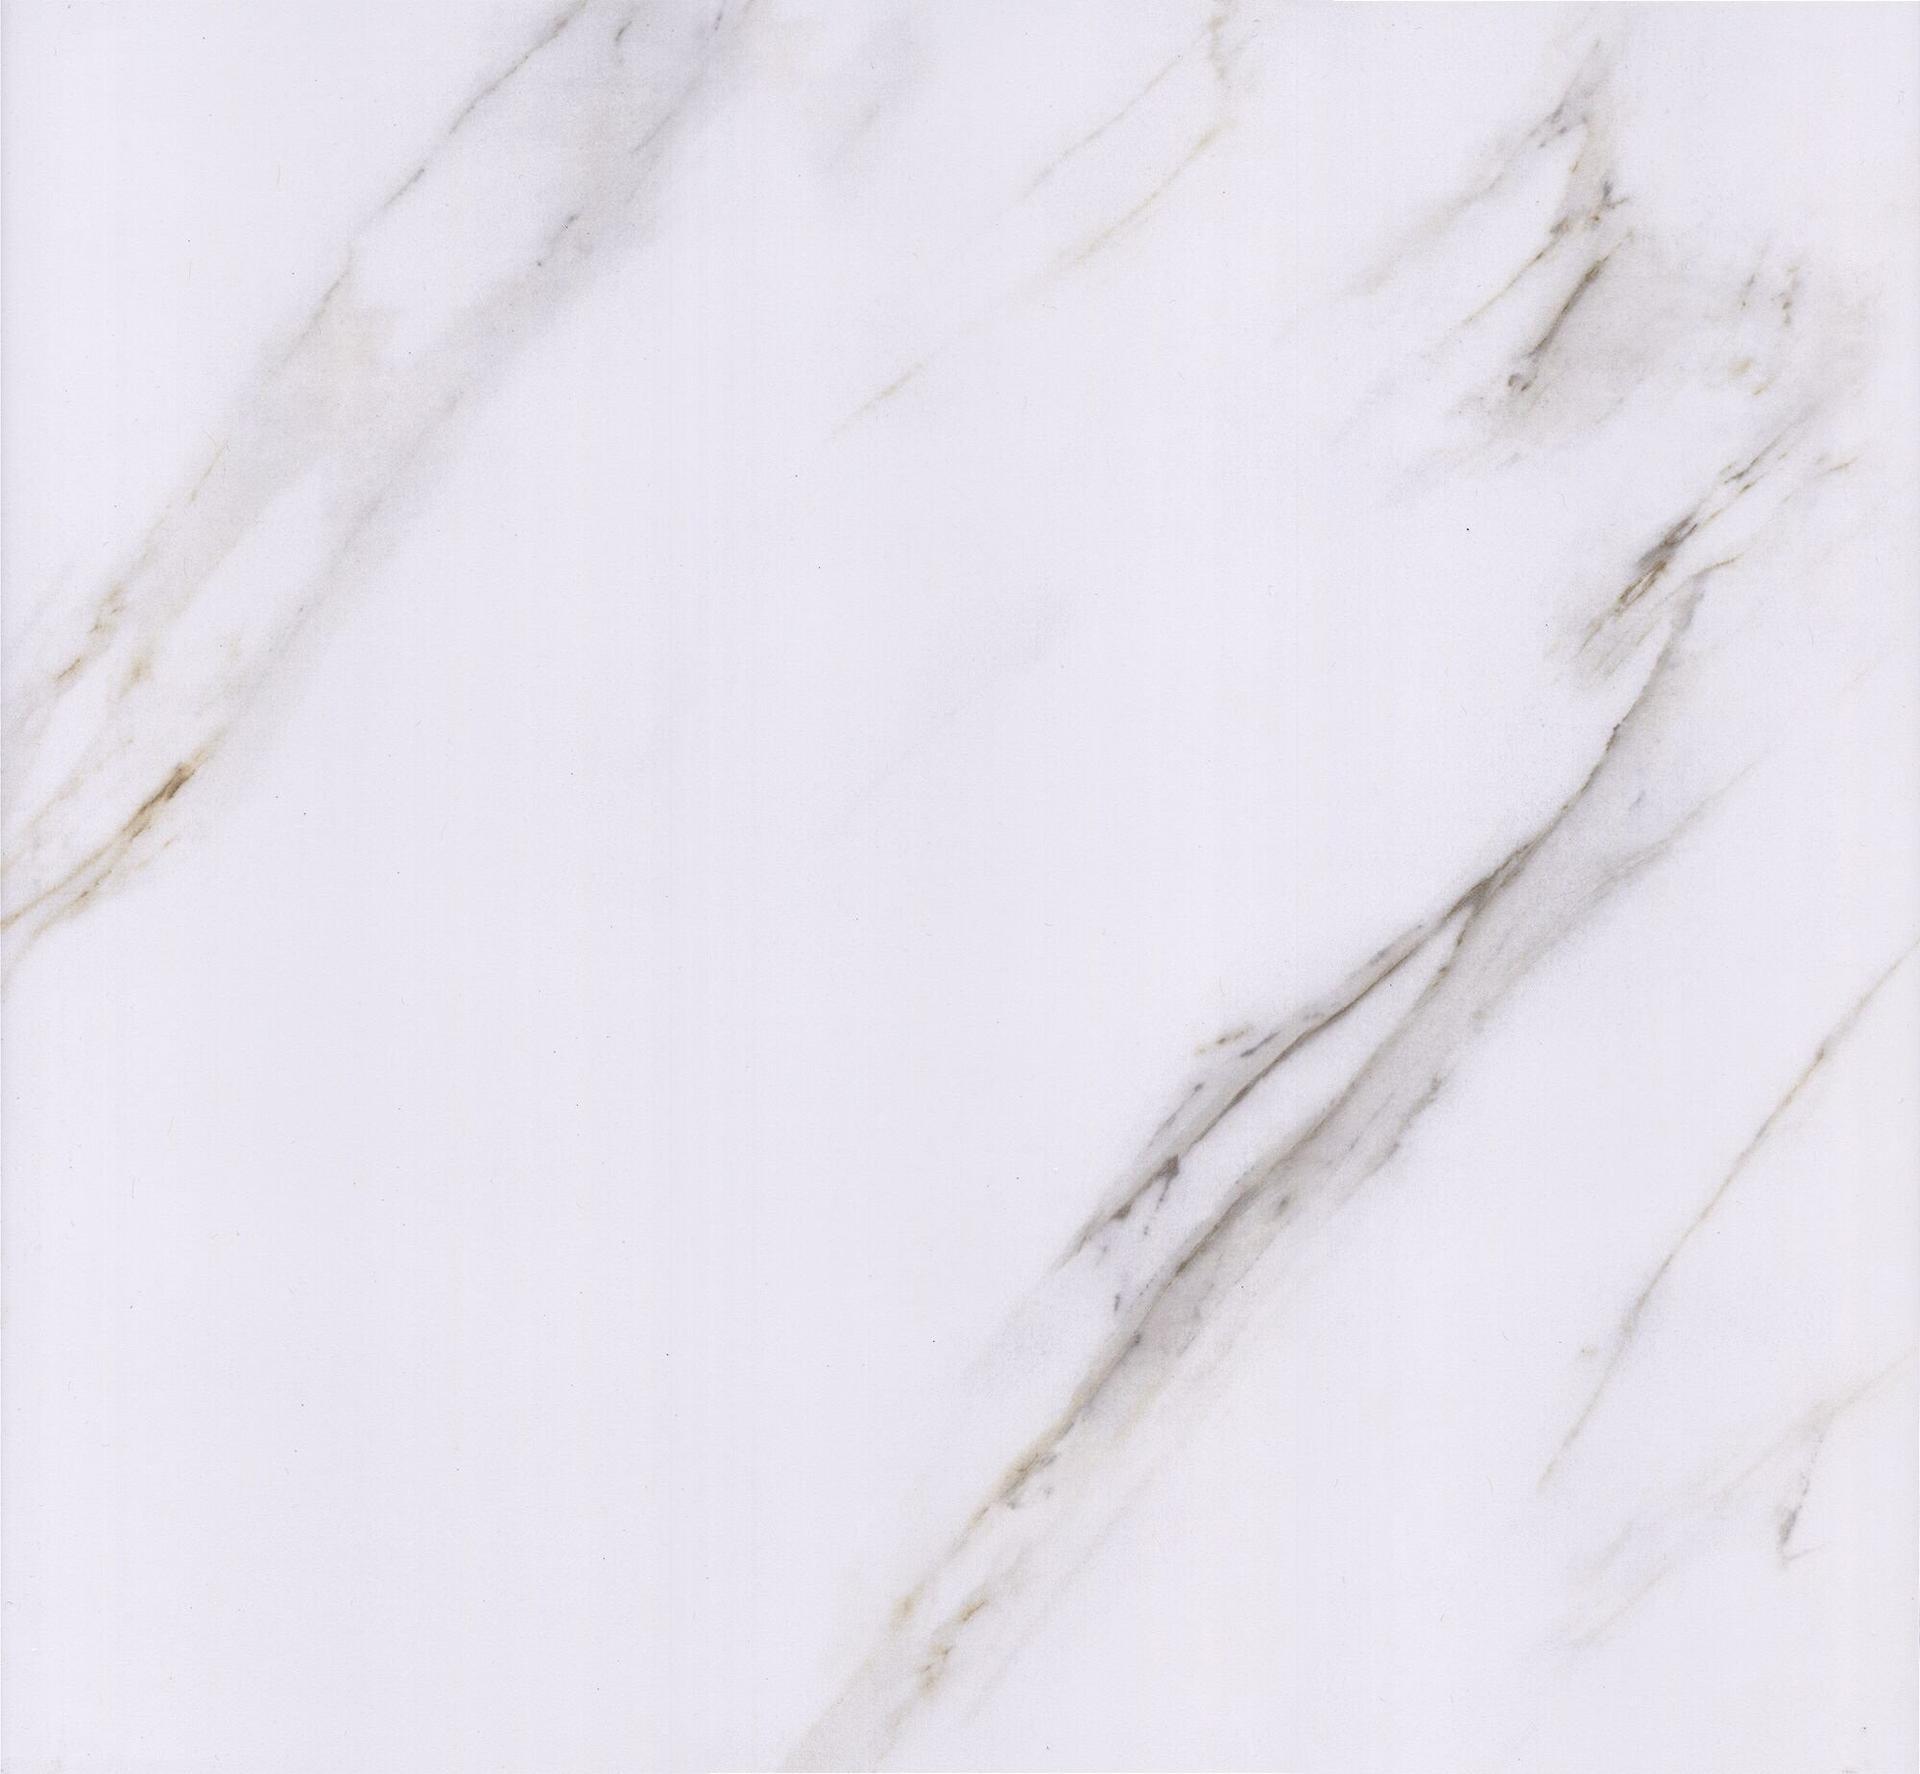 Carrara white Marble tiles  Full polished marble tiles   60x60 80x80cm/24x24' 32x32'